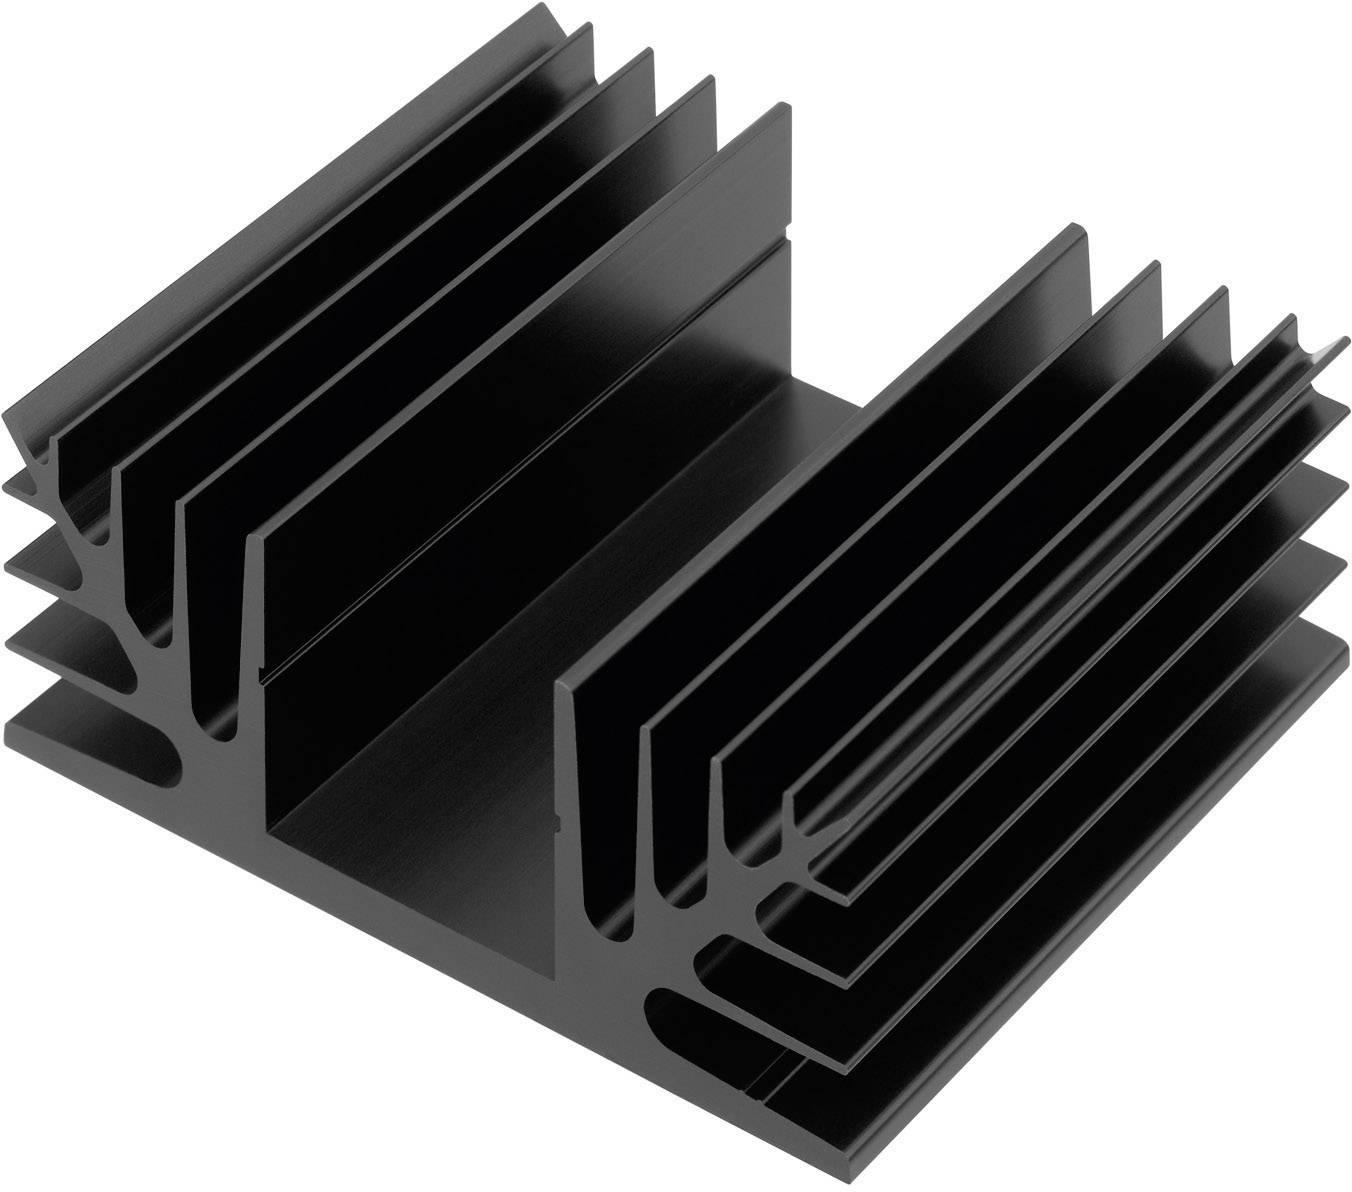 Chladič CTX Thermal Solutions CTX08/100, 88 x 35 x 100 mm, 1,5 K/W